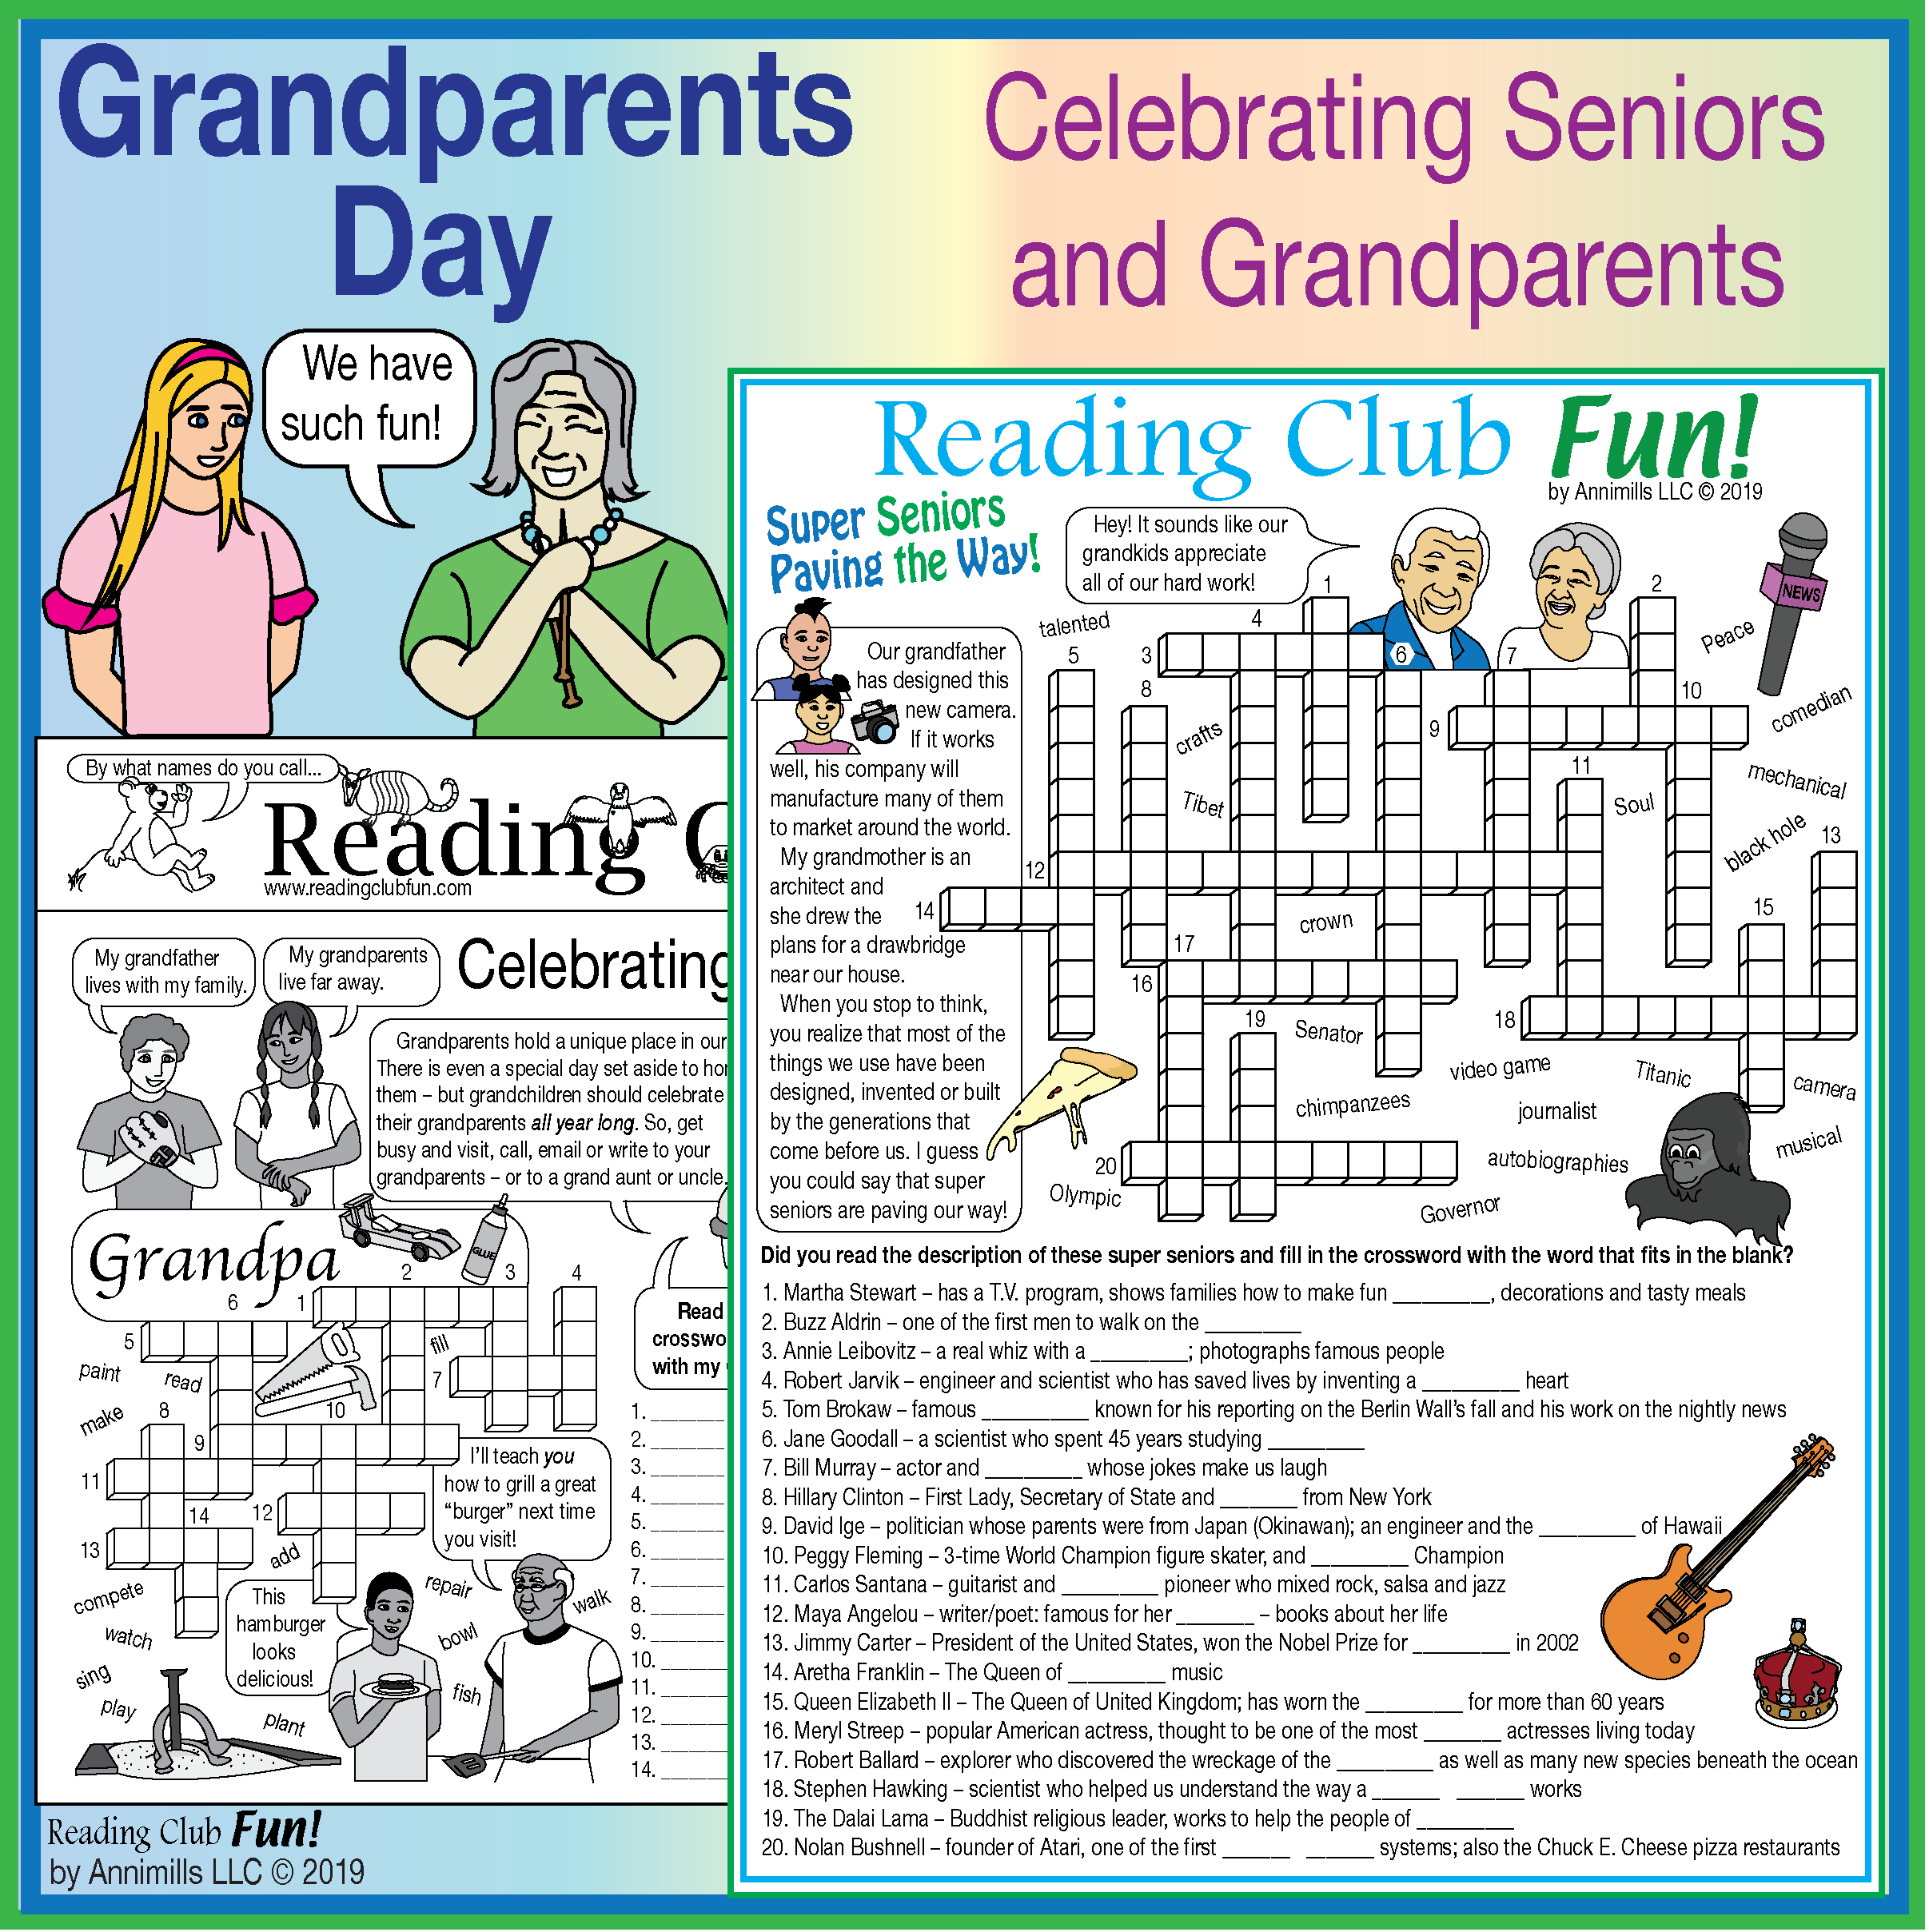 Celebrating Grandparents Grandparents Day Lively